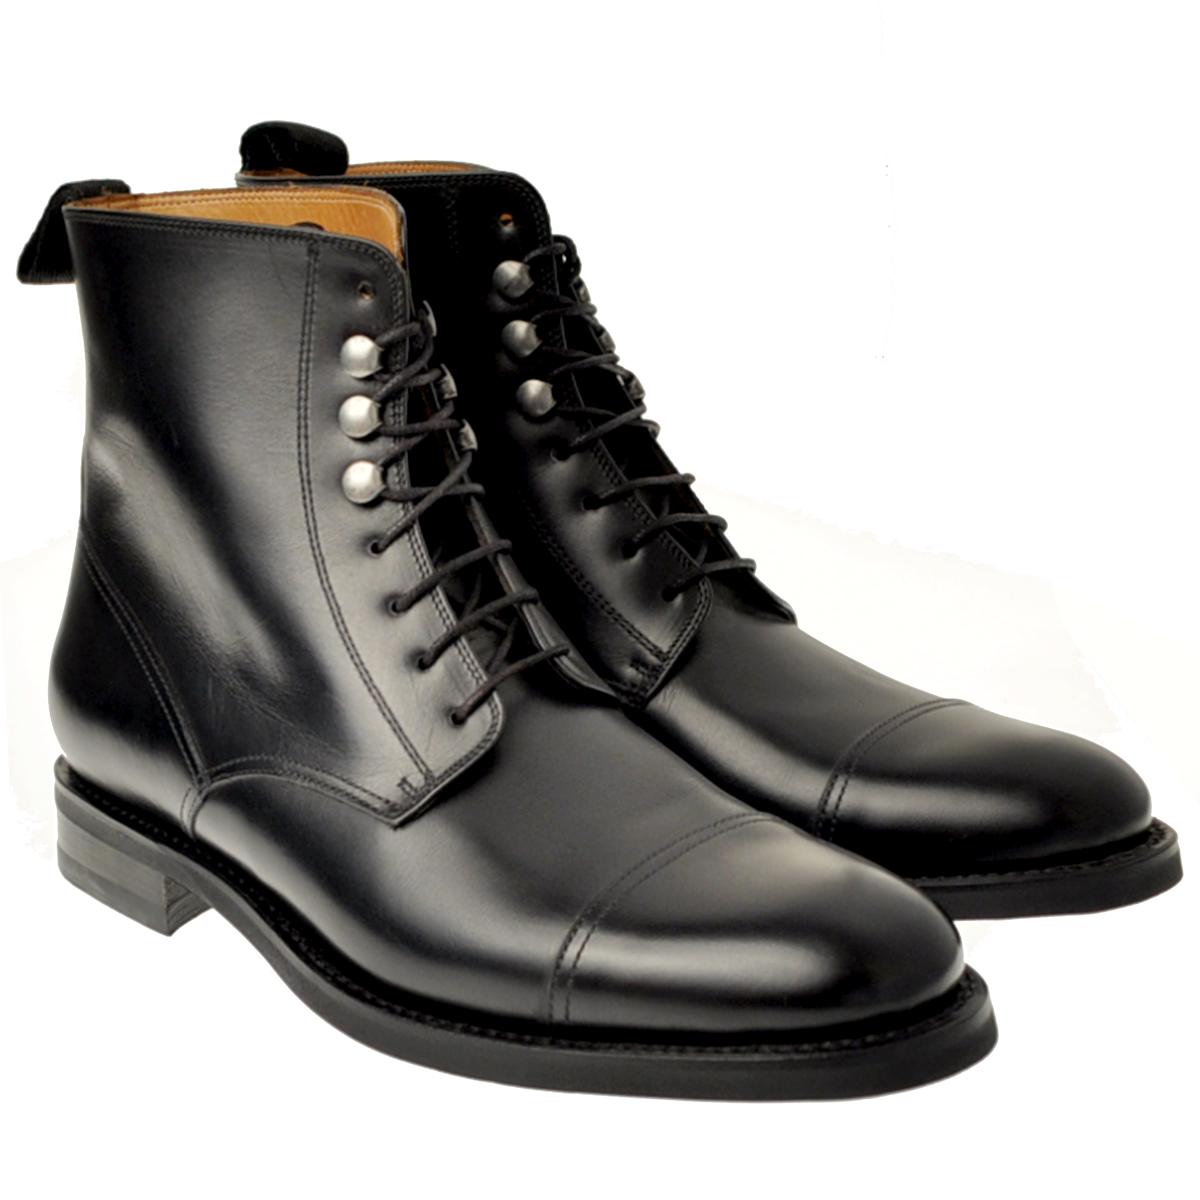 Mano Boots